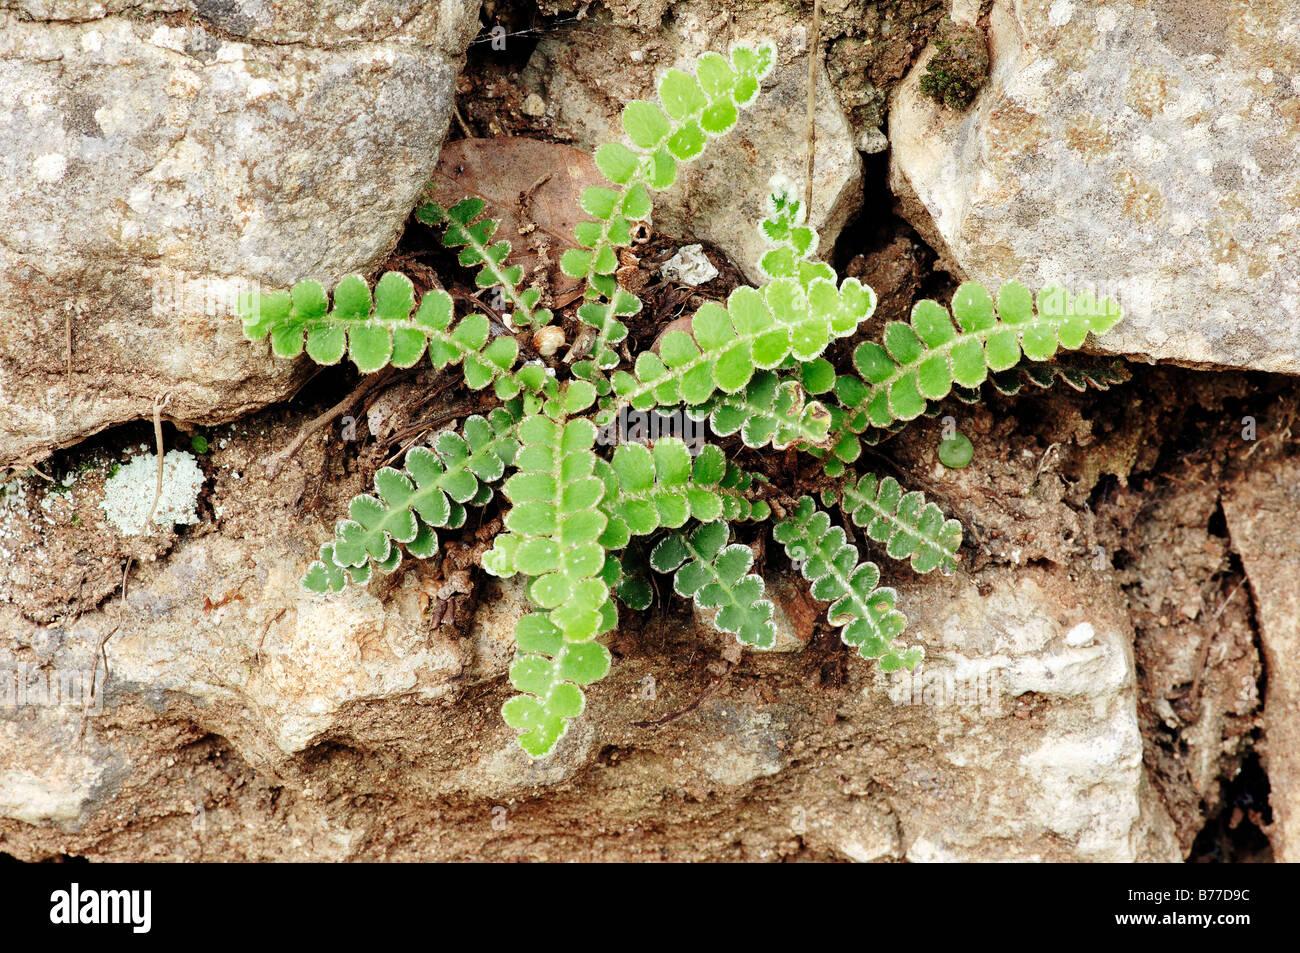 Helecho Rustyback o escamoso Maidenhair (Asplenium ceterach, Ceterach officinarum, Asplenium officinarum), Provenza, Imagen De Stock